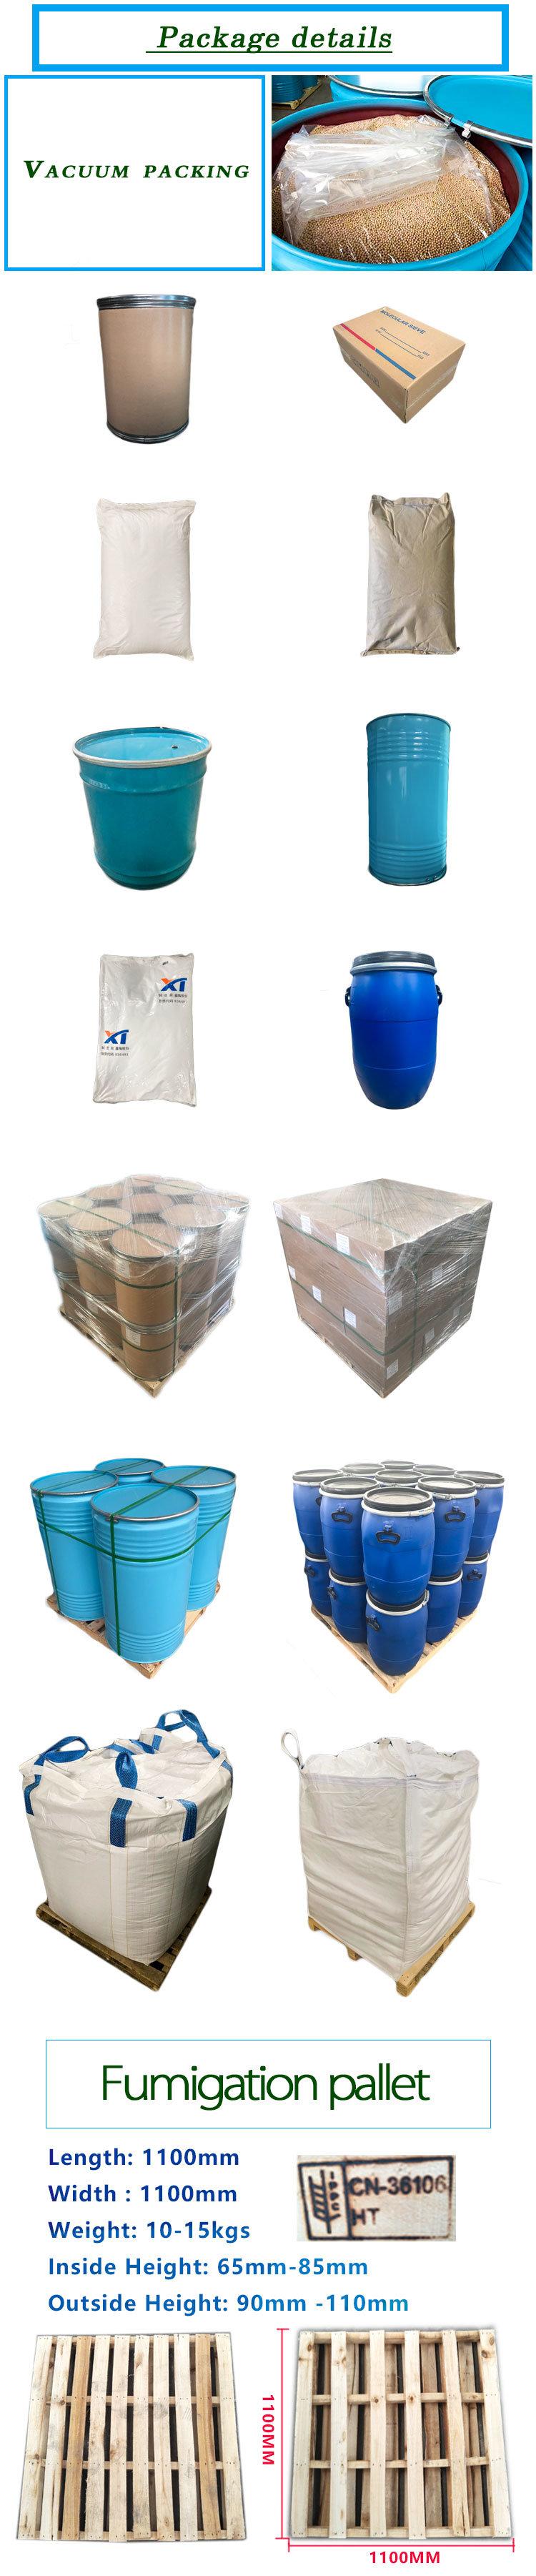 Zeolite 3A Molecular Sieve Adsorbent for Ethanol Drying